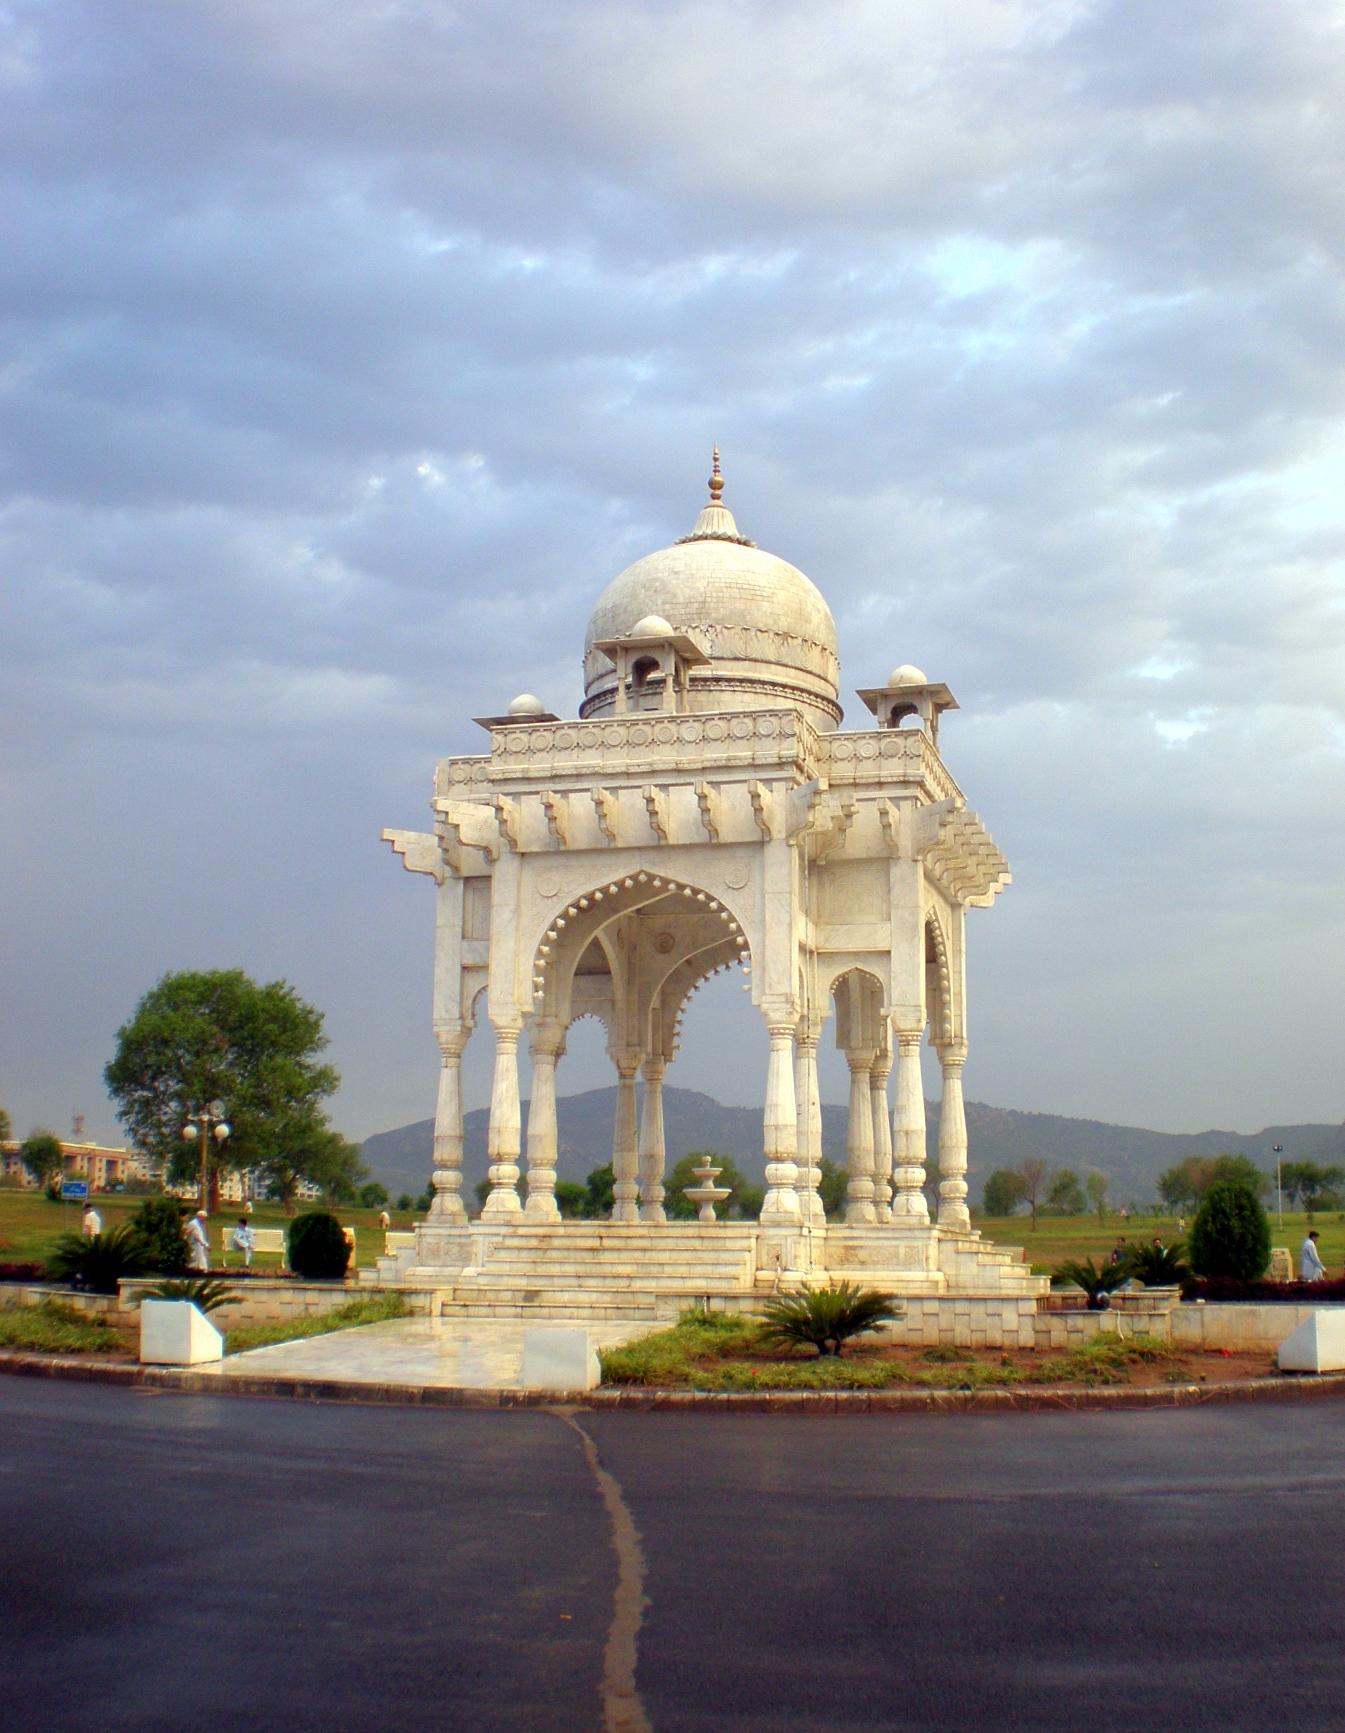 Monument at Fatima Jinnah Park in Islamabad